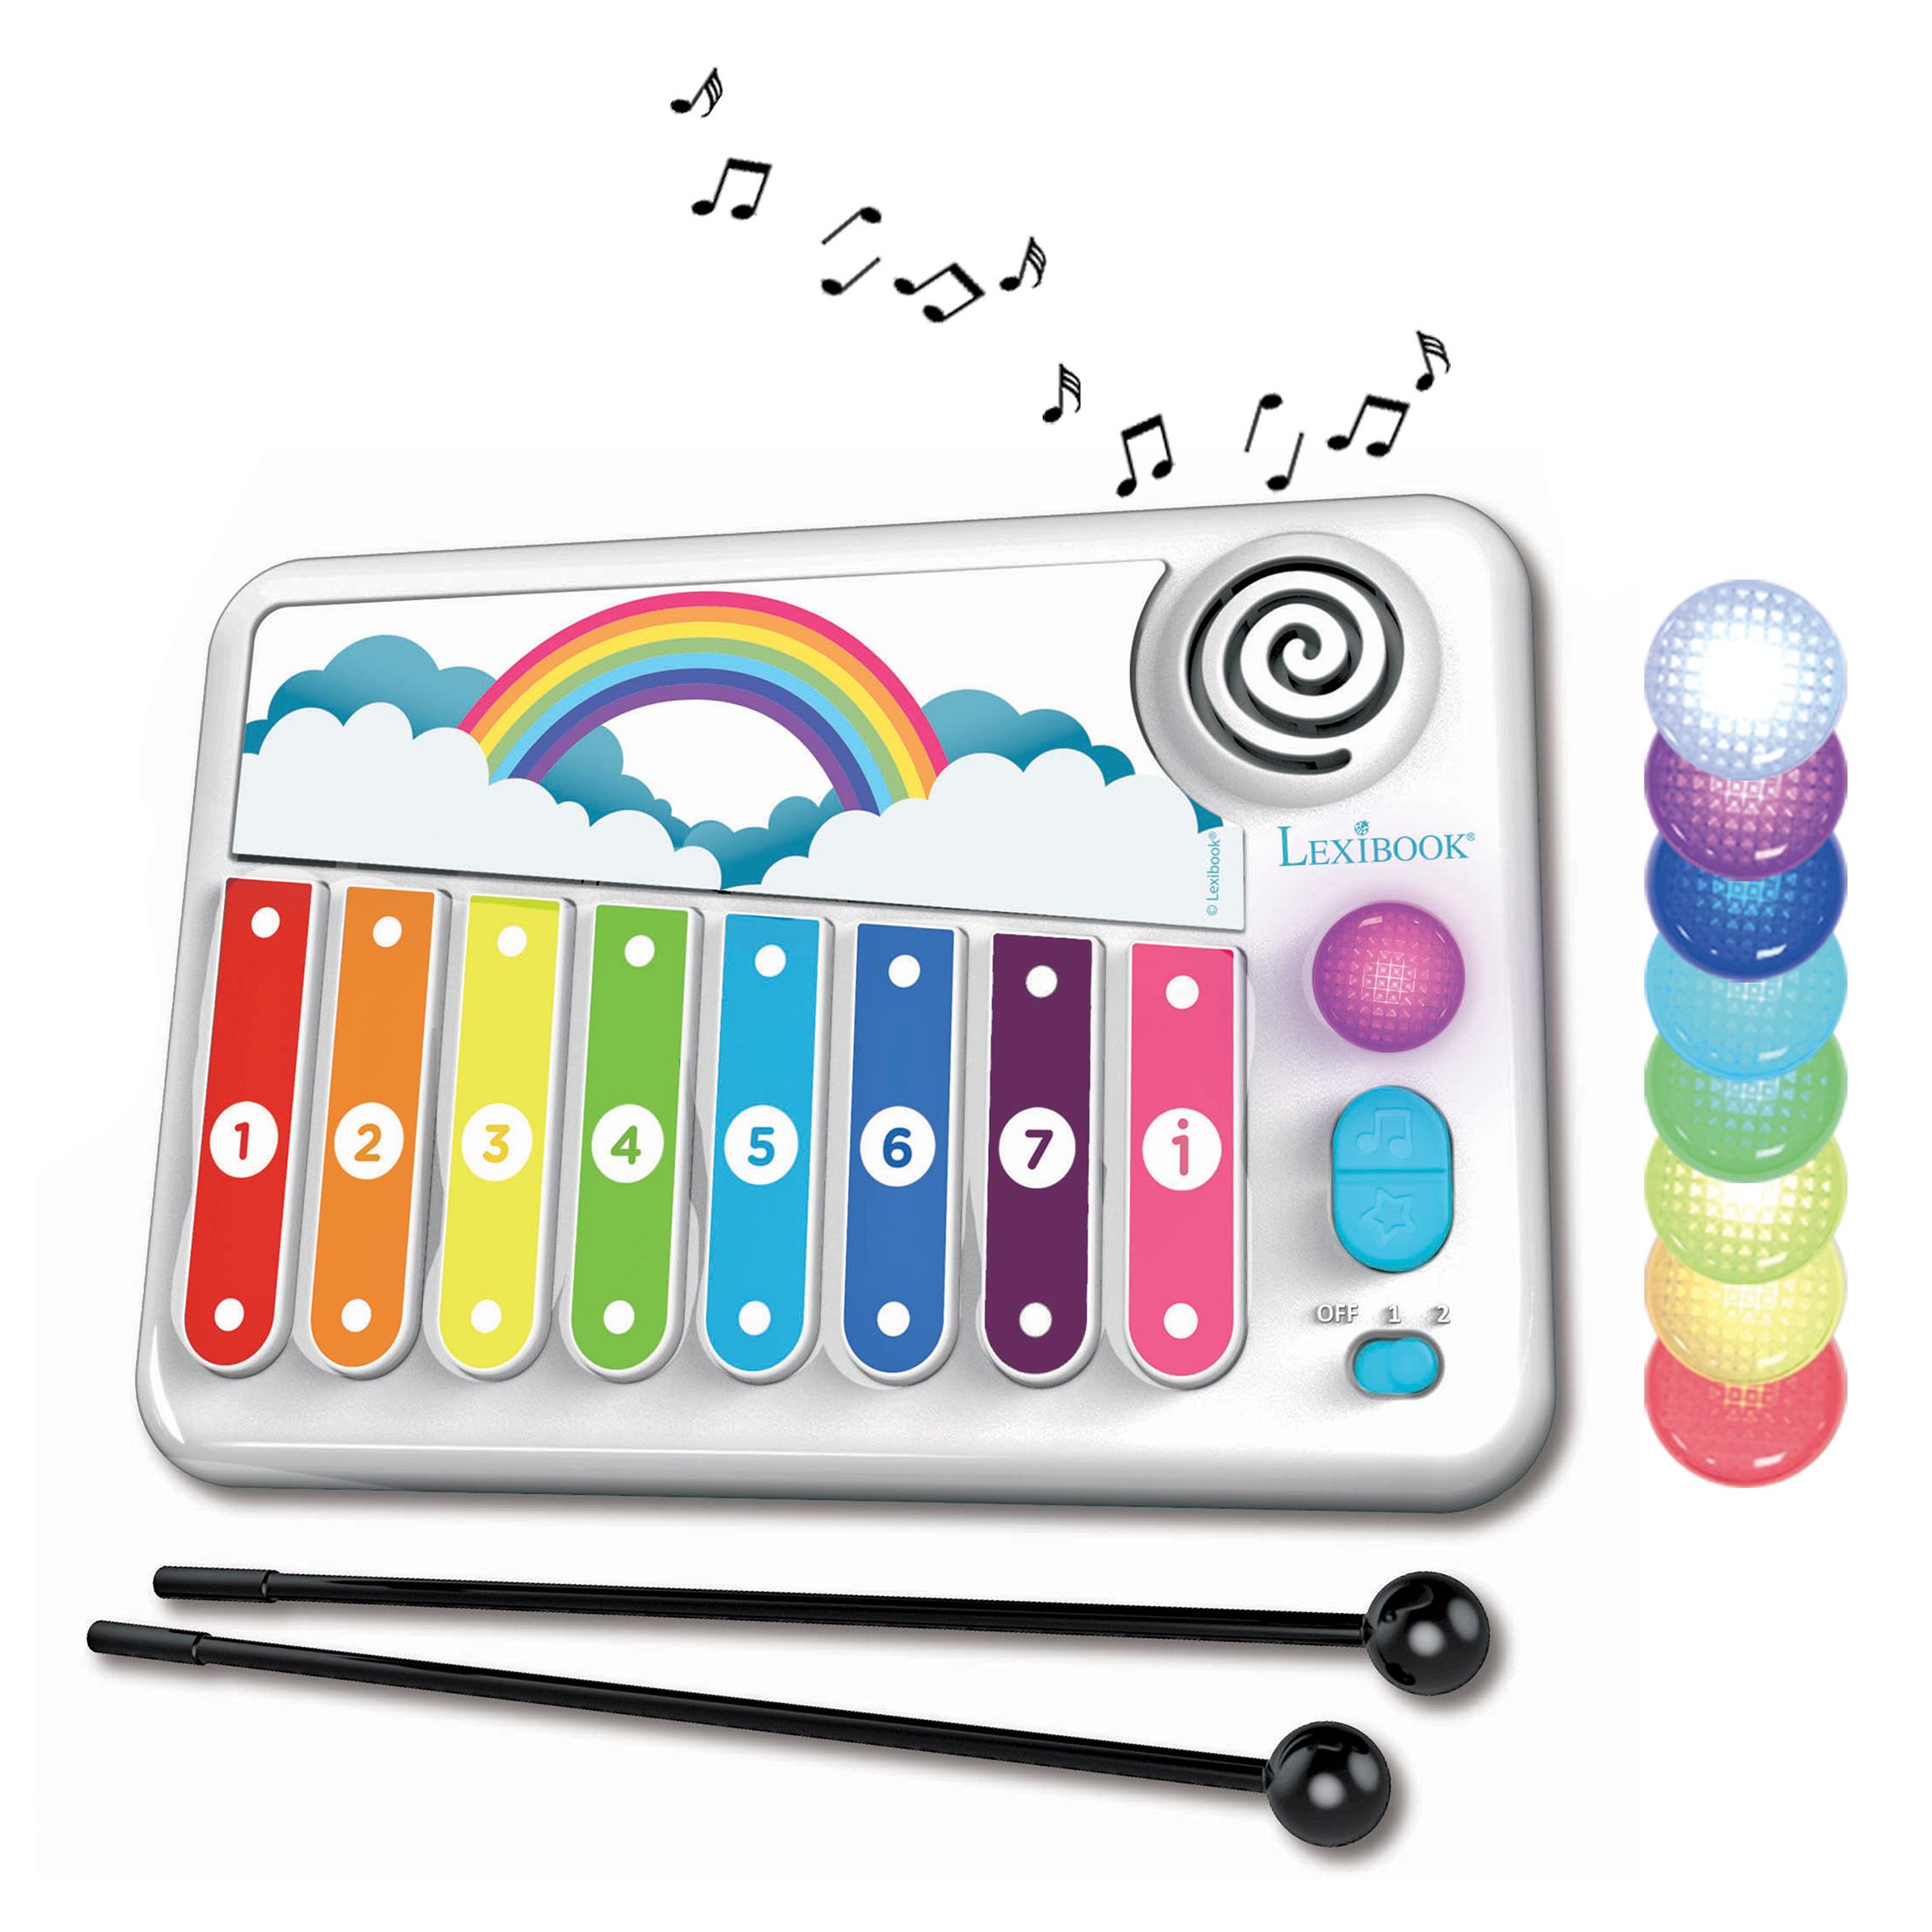 Lexibook - XYLO-FUN Electronic Xylophone with Learning Music method with Lights (K340)